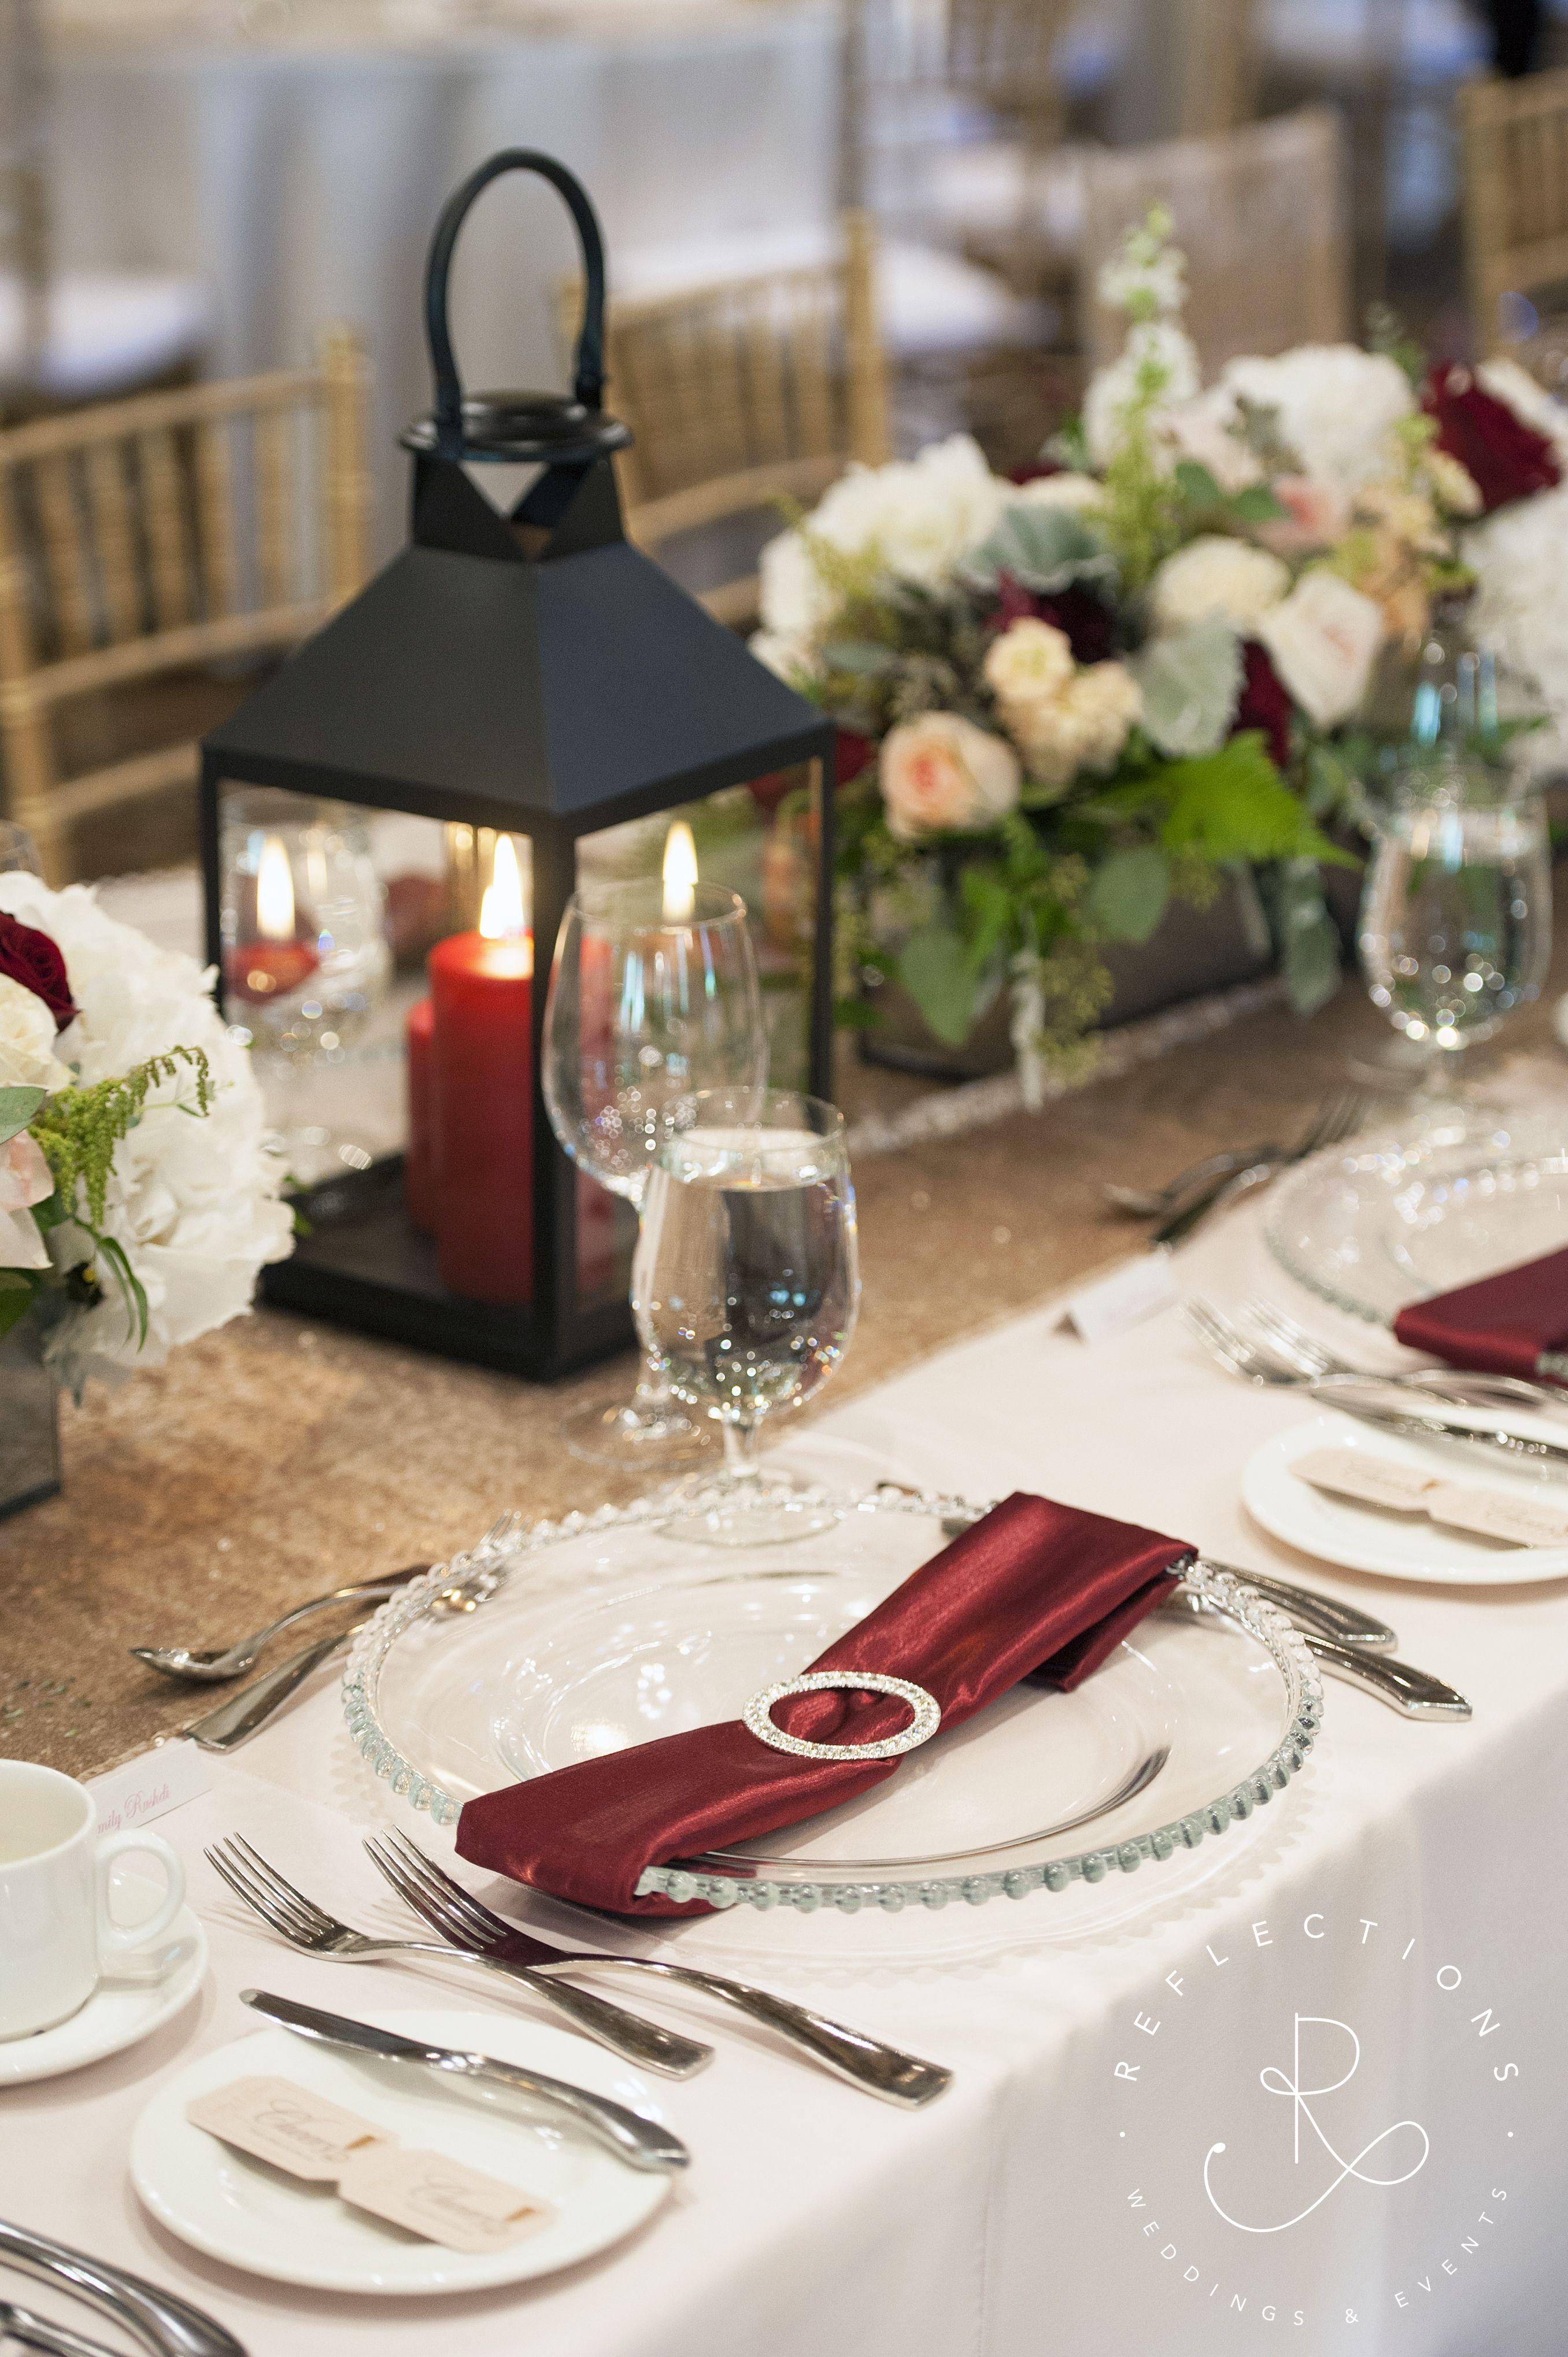 Ivory blush and burgundy wedding decor with lantern